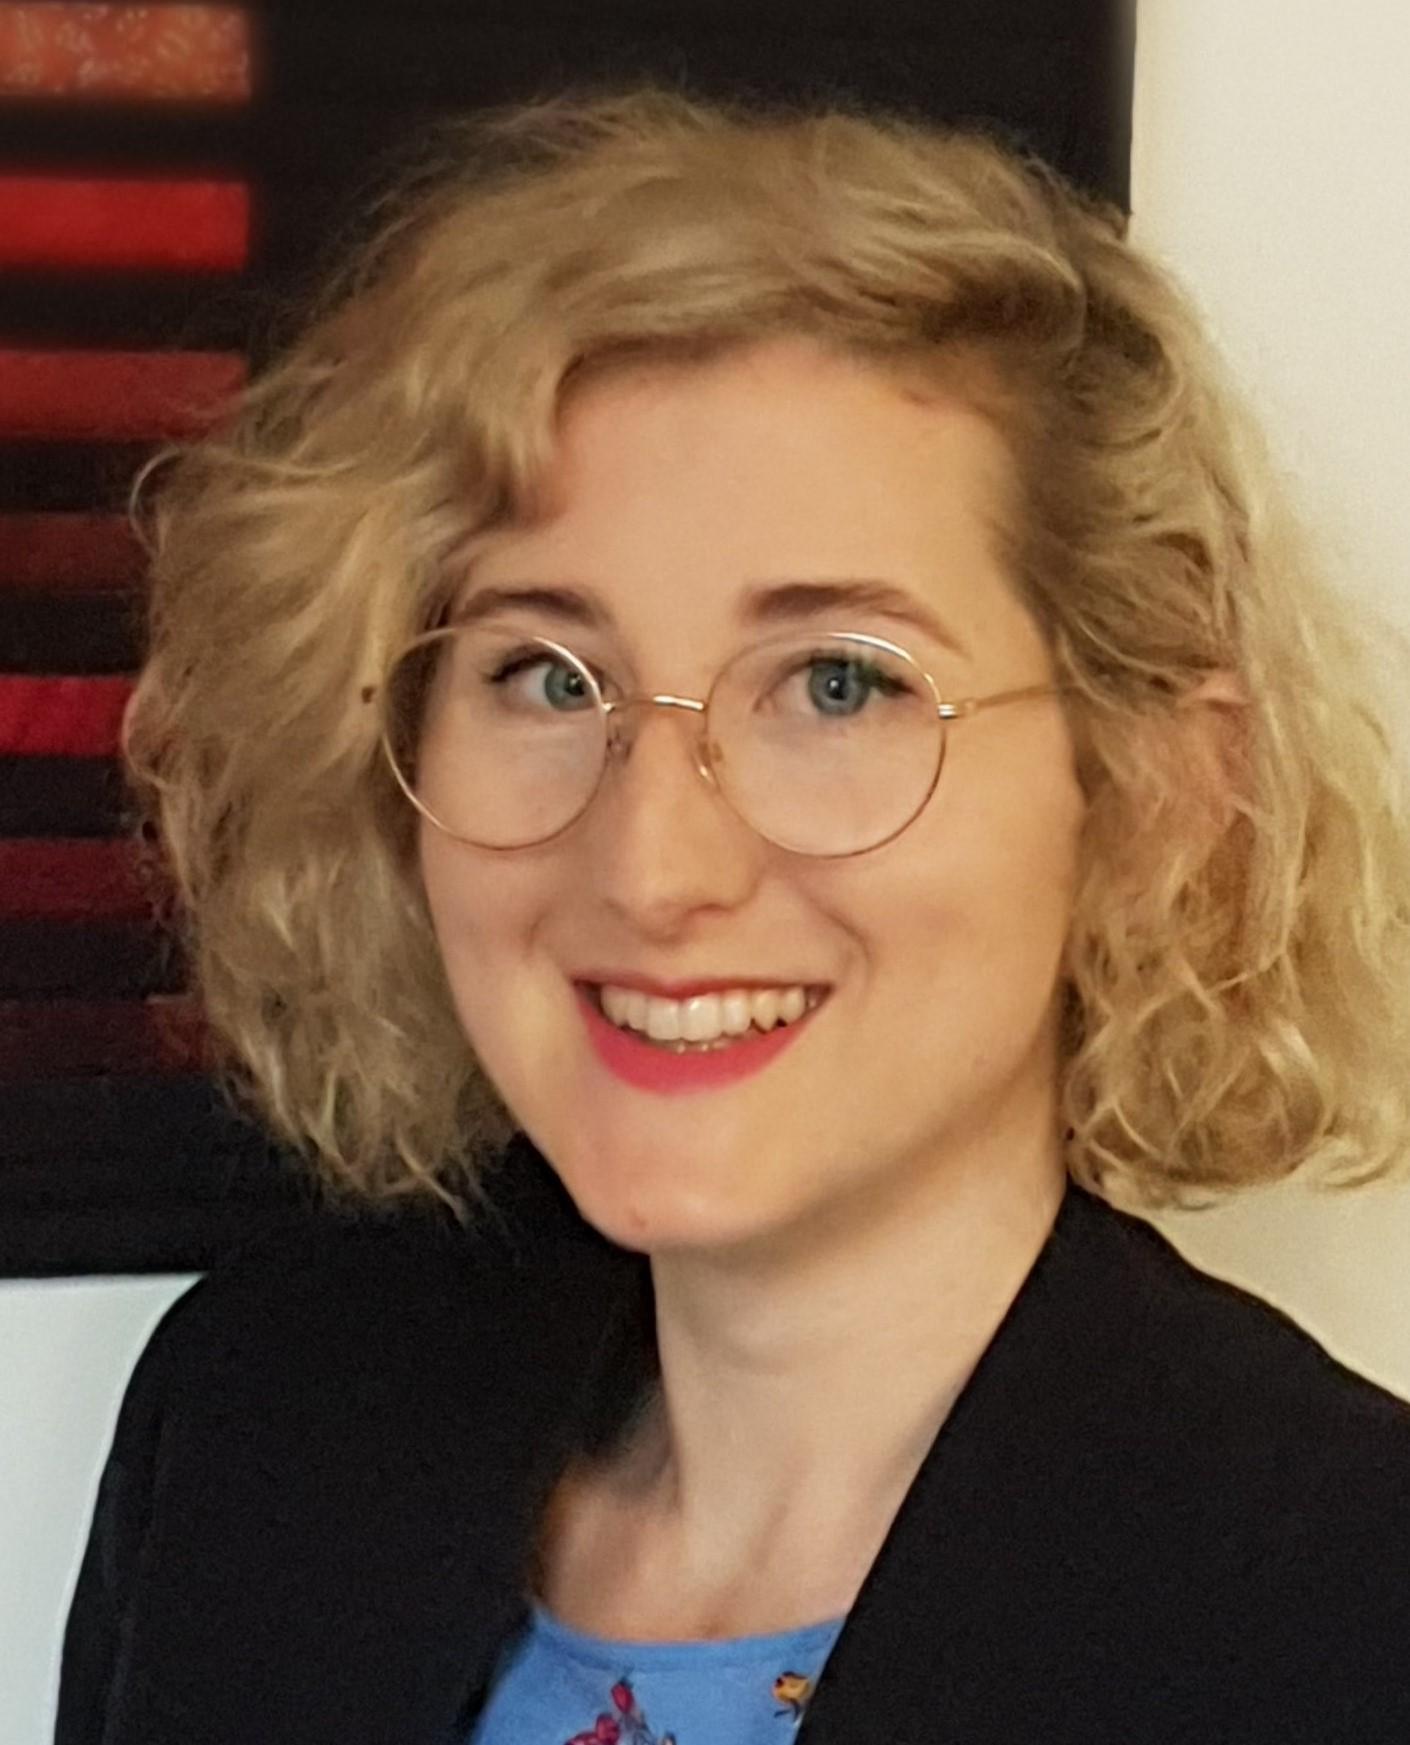 Emma Rose Luxton